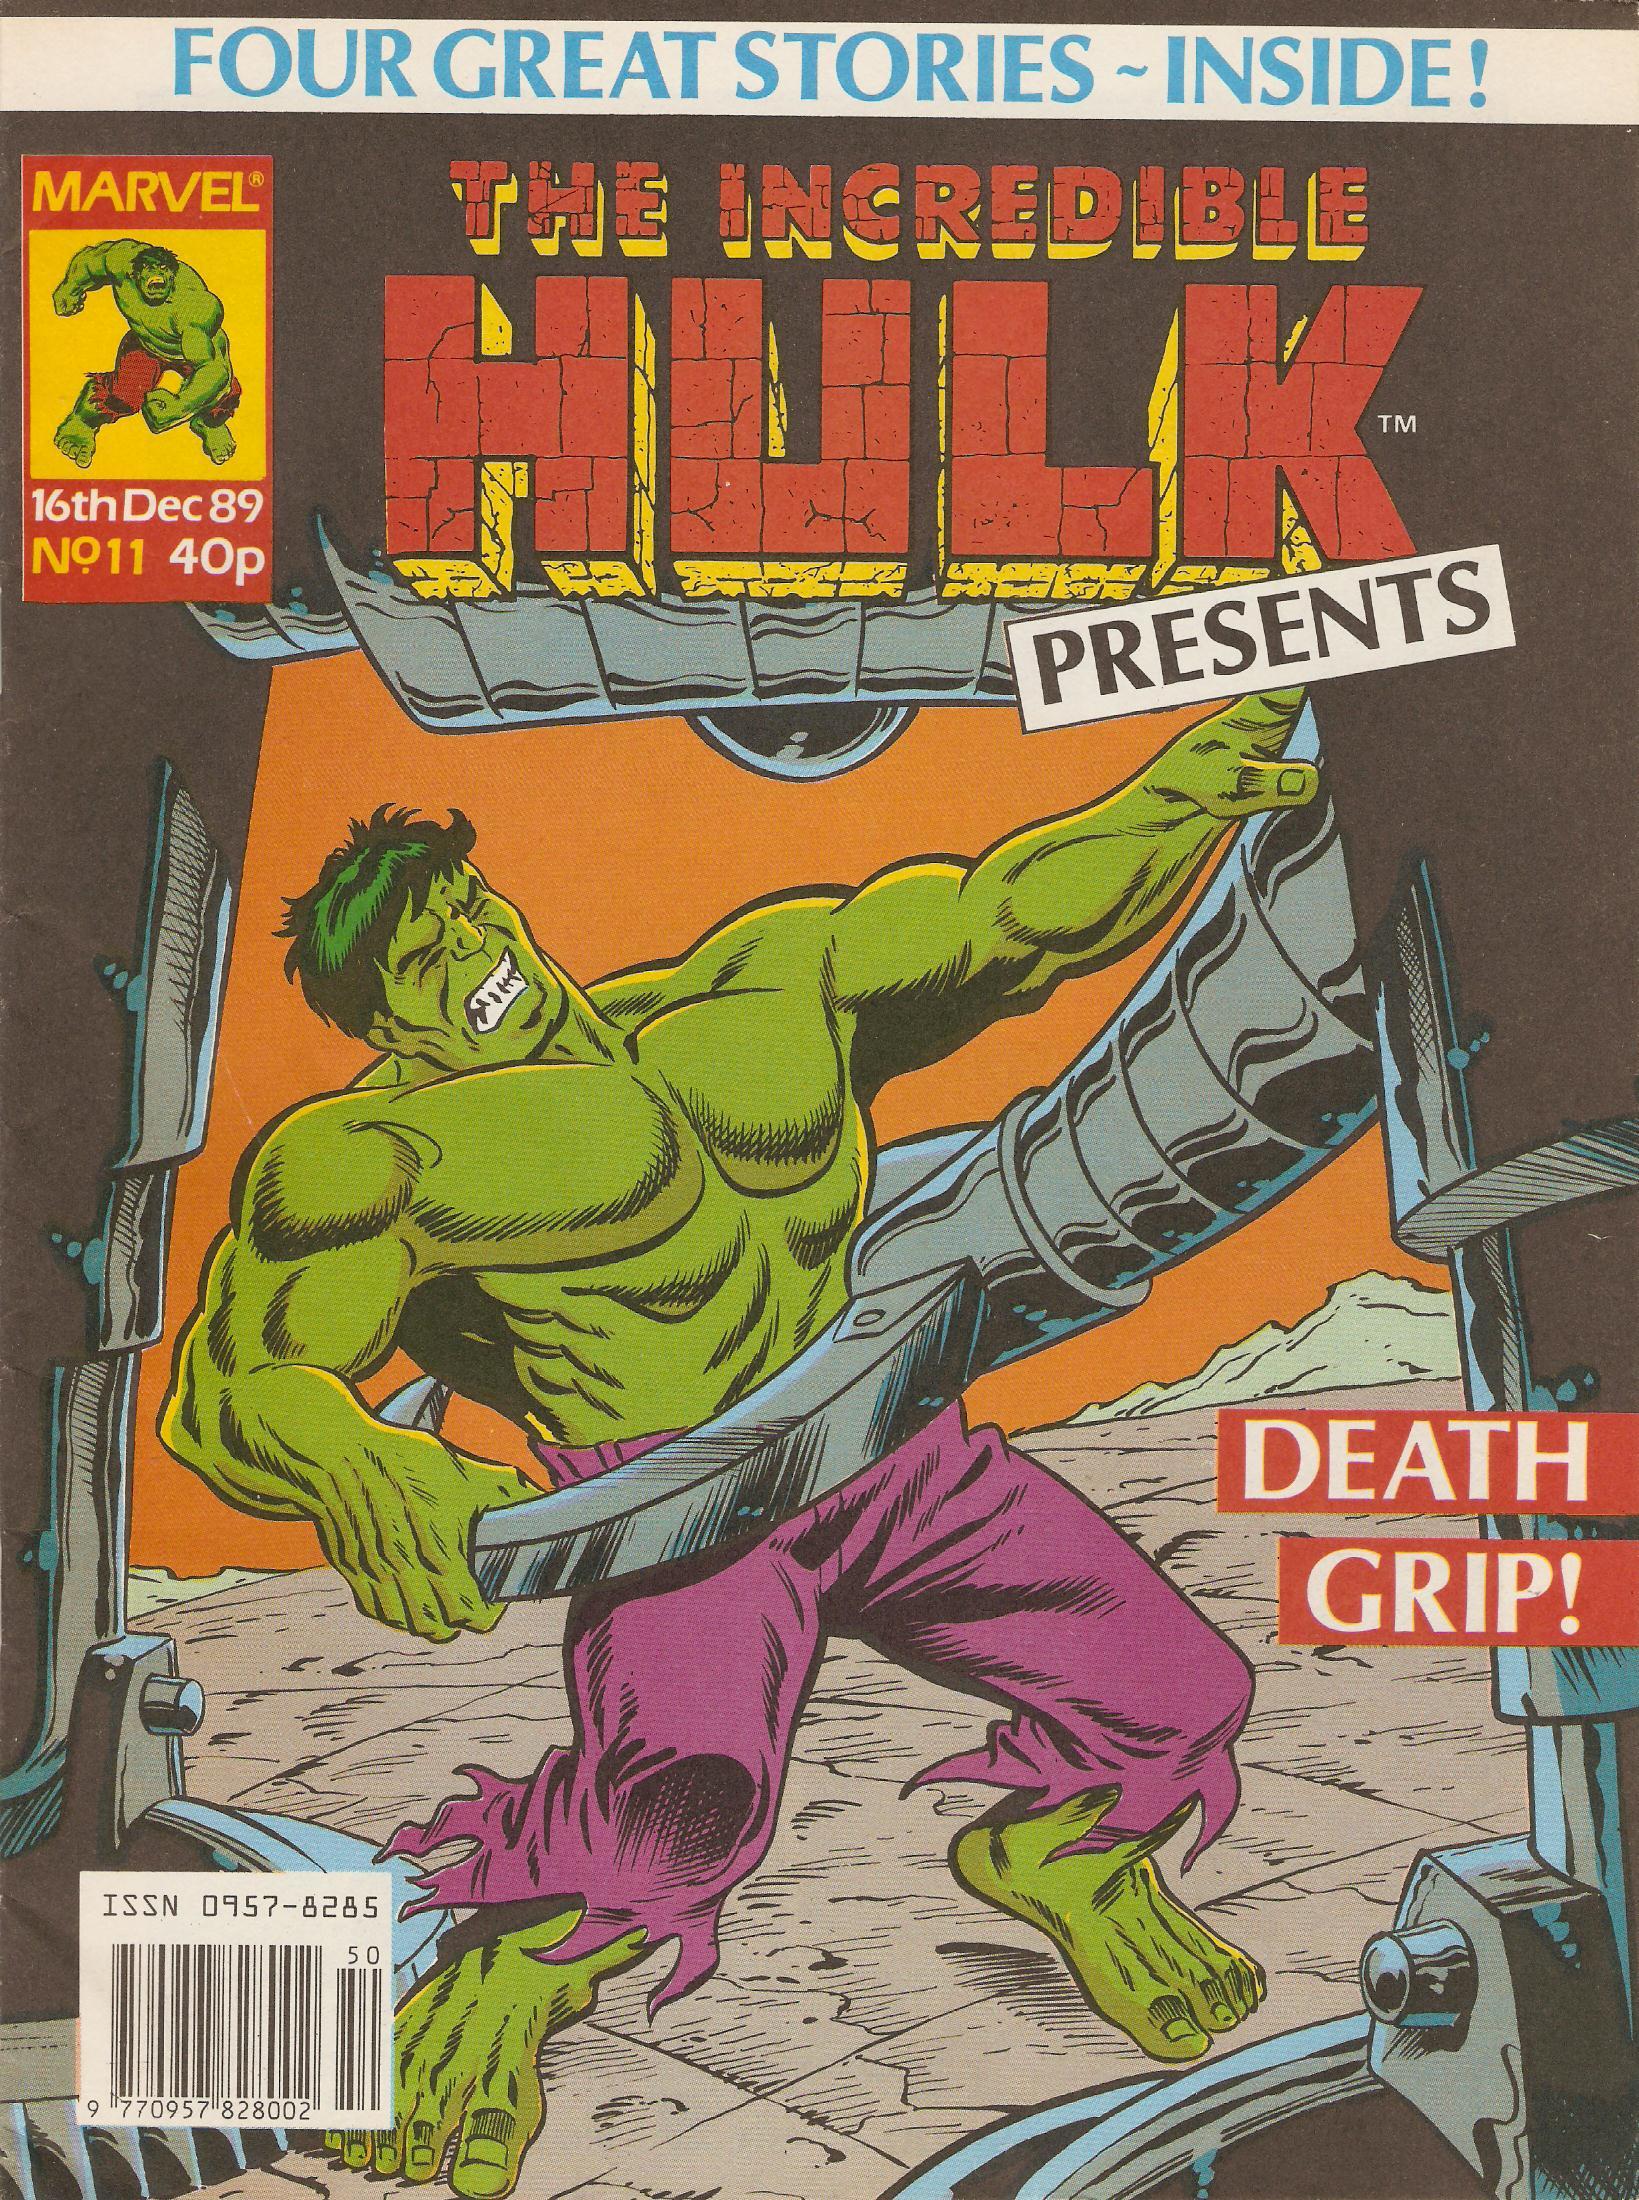 Incredible hulk presents 11